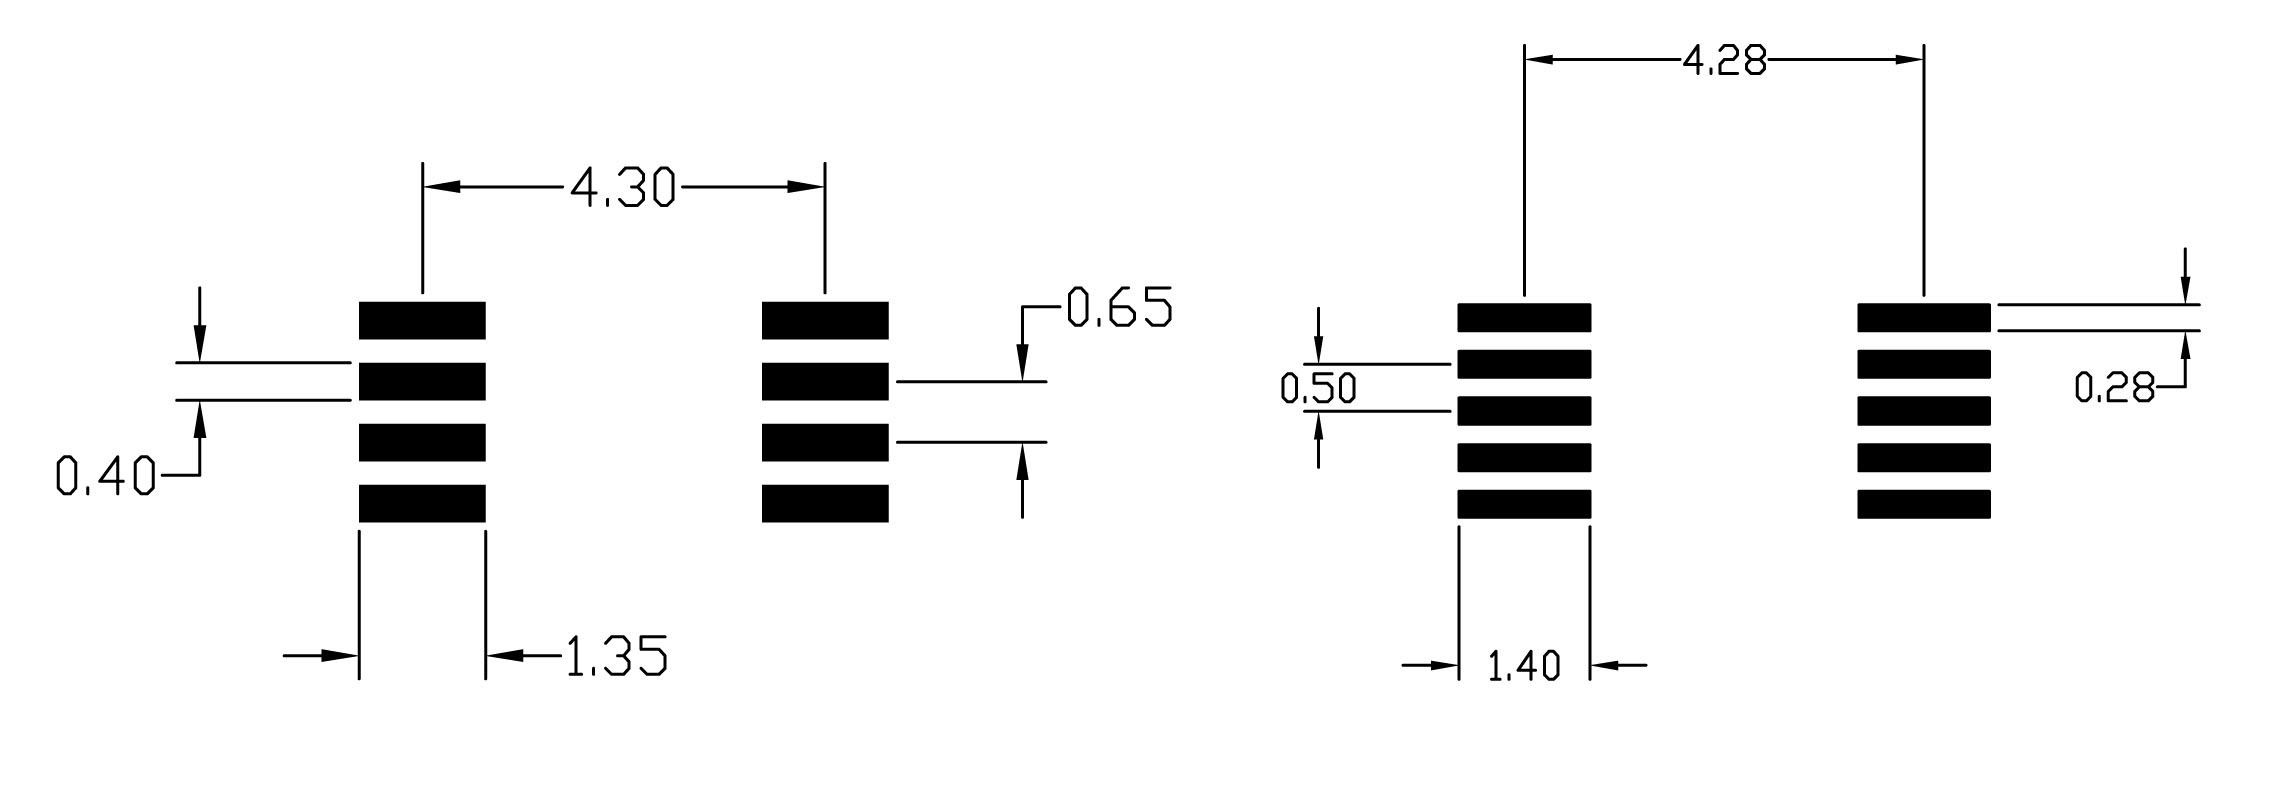 Solucionado Qu es MAX IC paquete  circuito